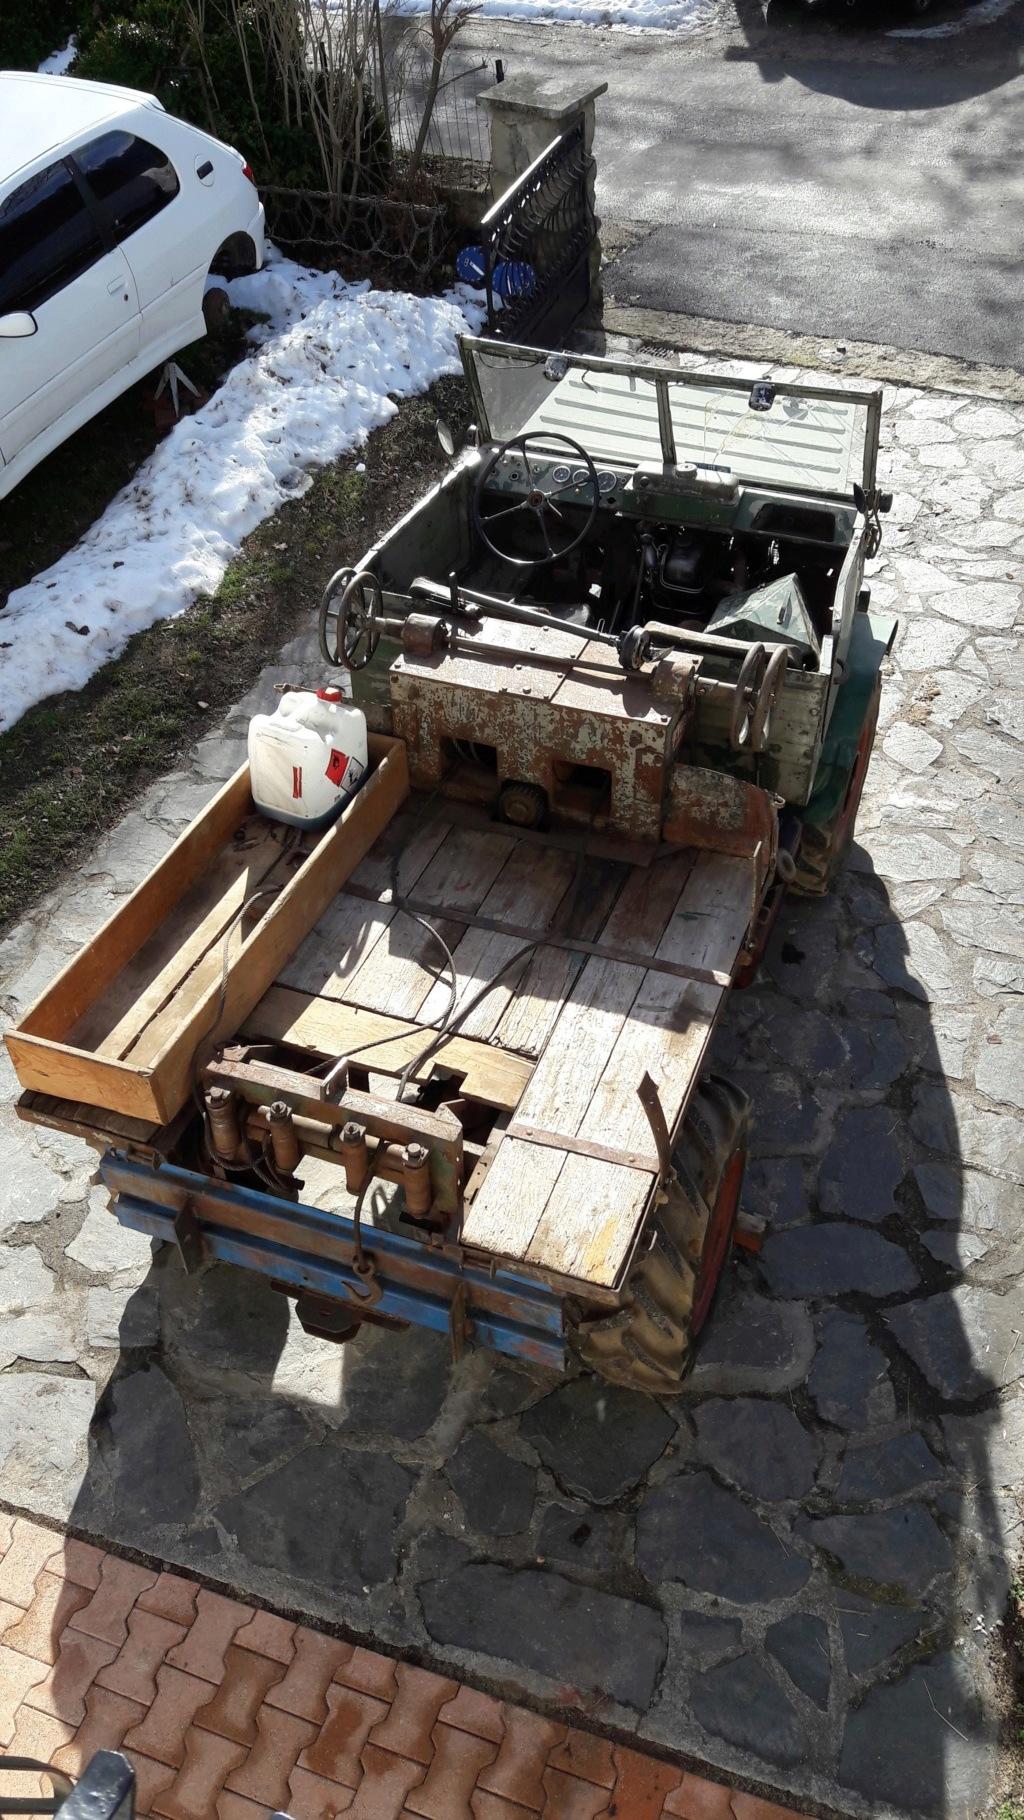 restauration unimog 411 112 par nico 700 raptor - Page 39 20170110